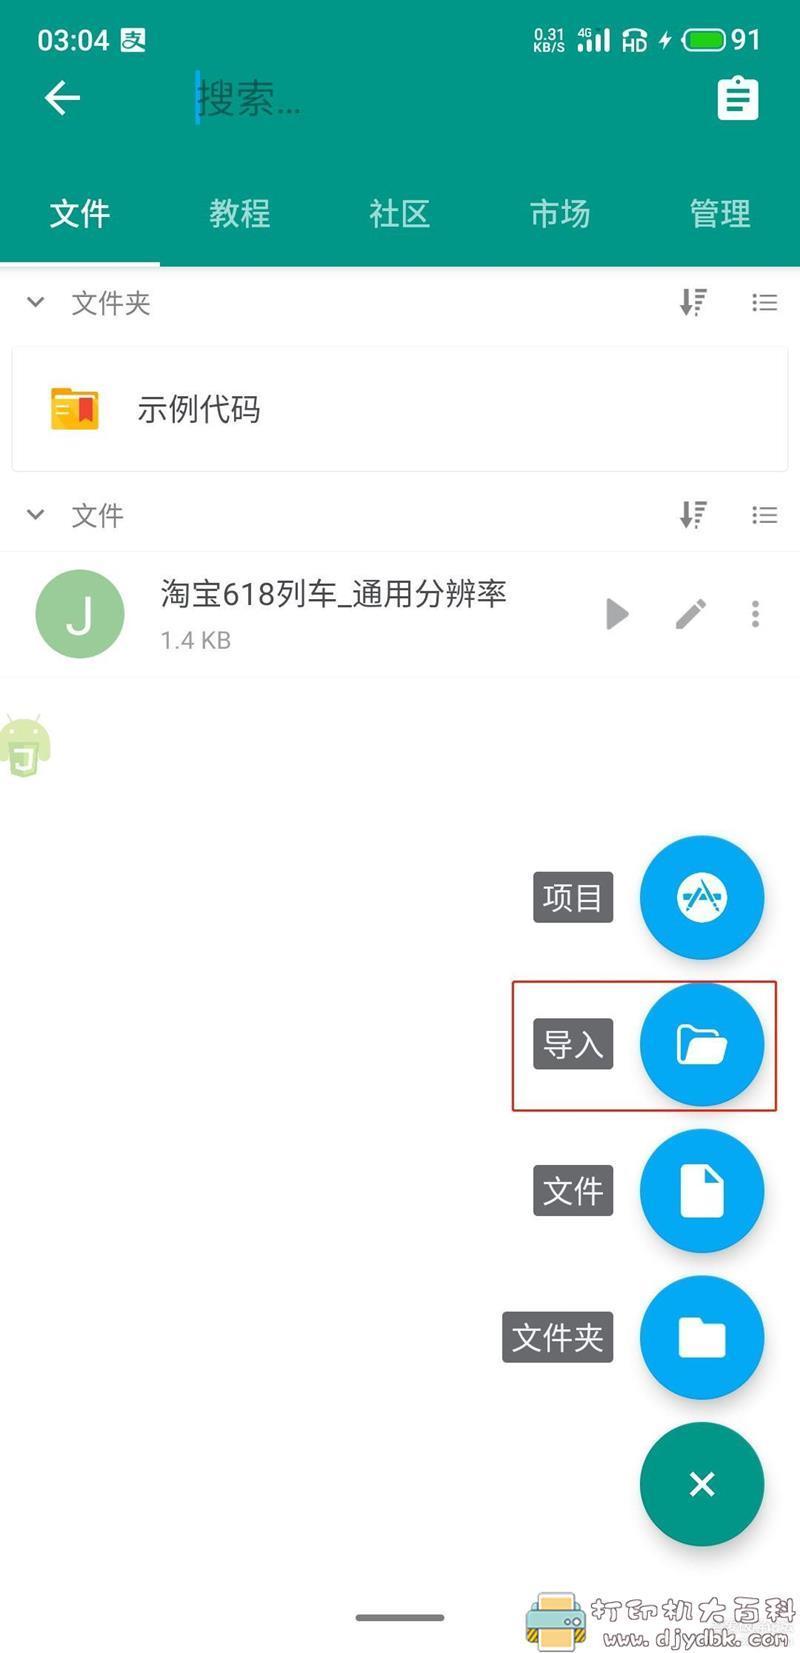 [Android]淘宝618列车活动 自动浏览任务 Auto.js脚本图片 No.1